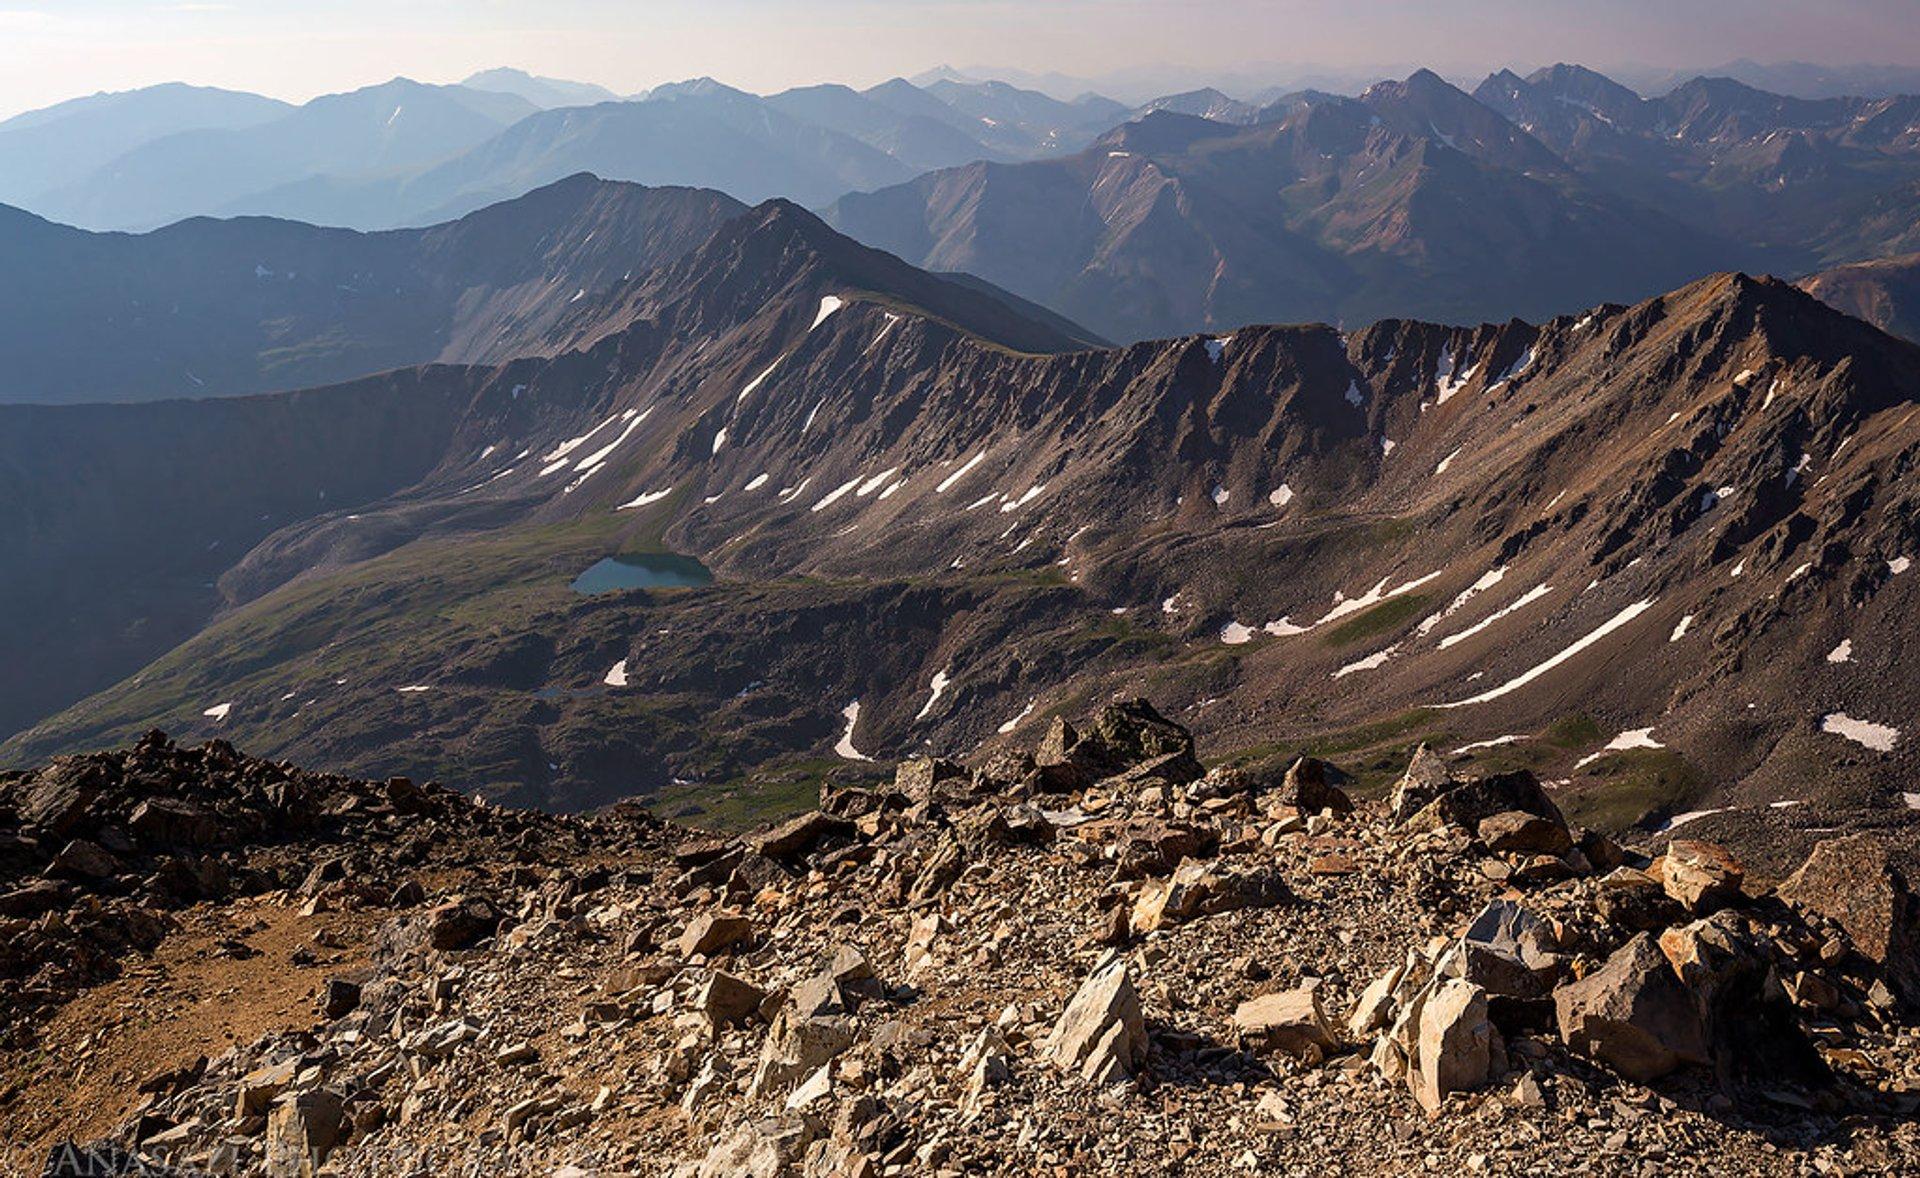 Best time to see La Plata Peak in Colorado 2020